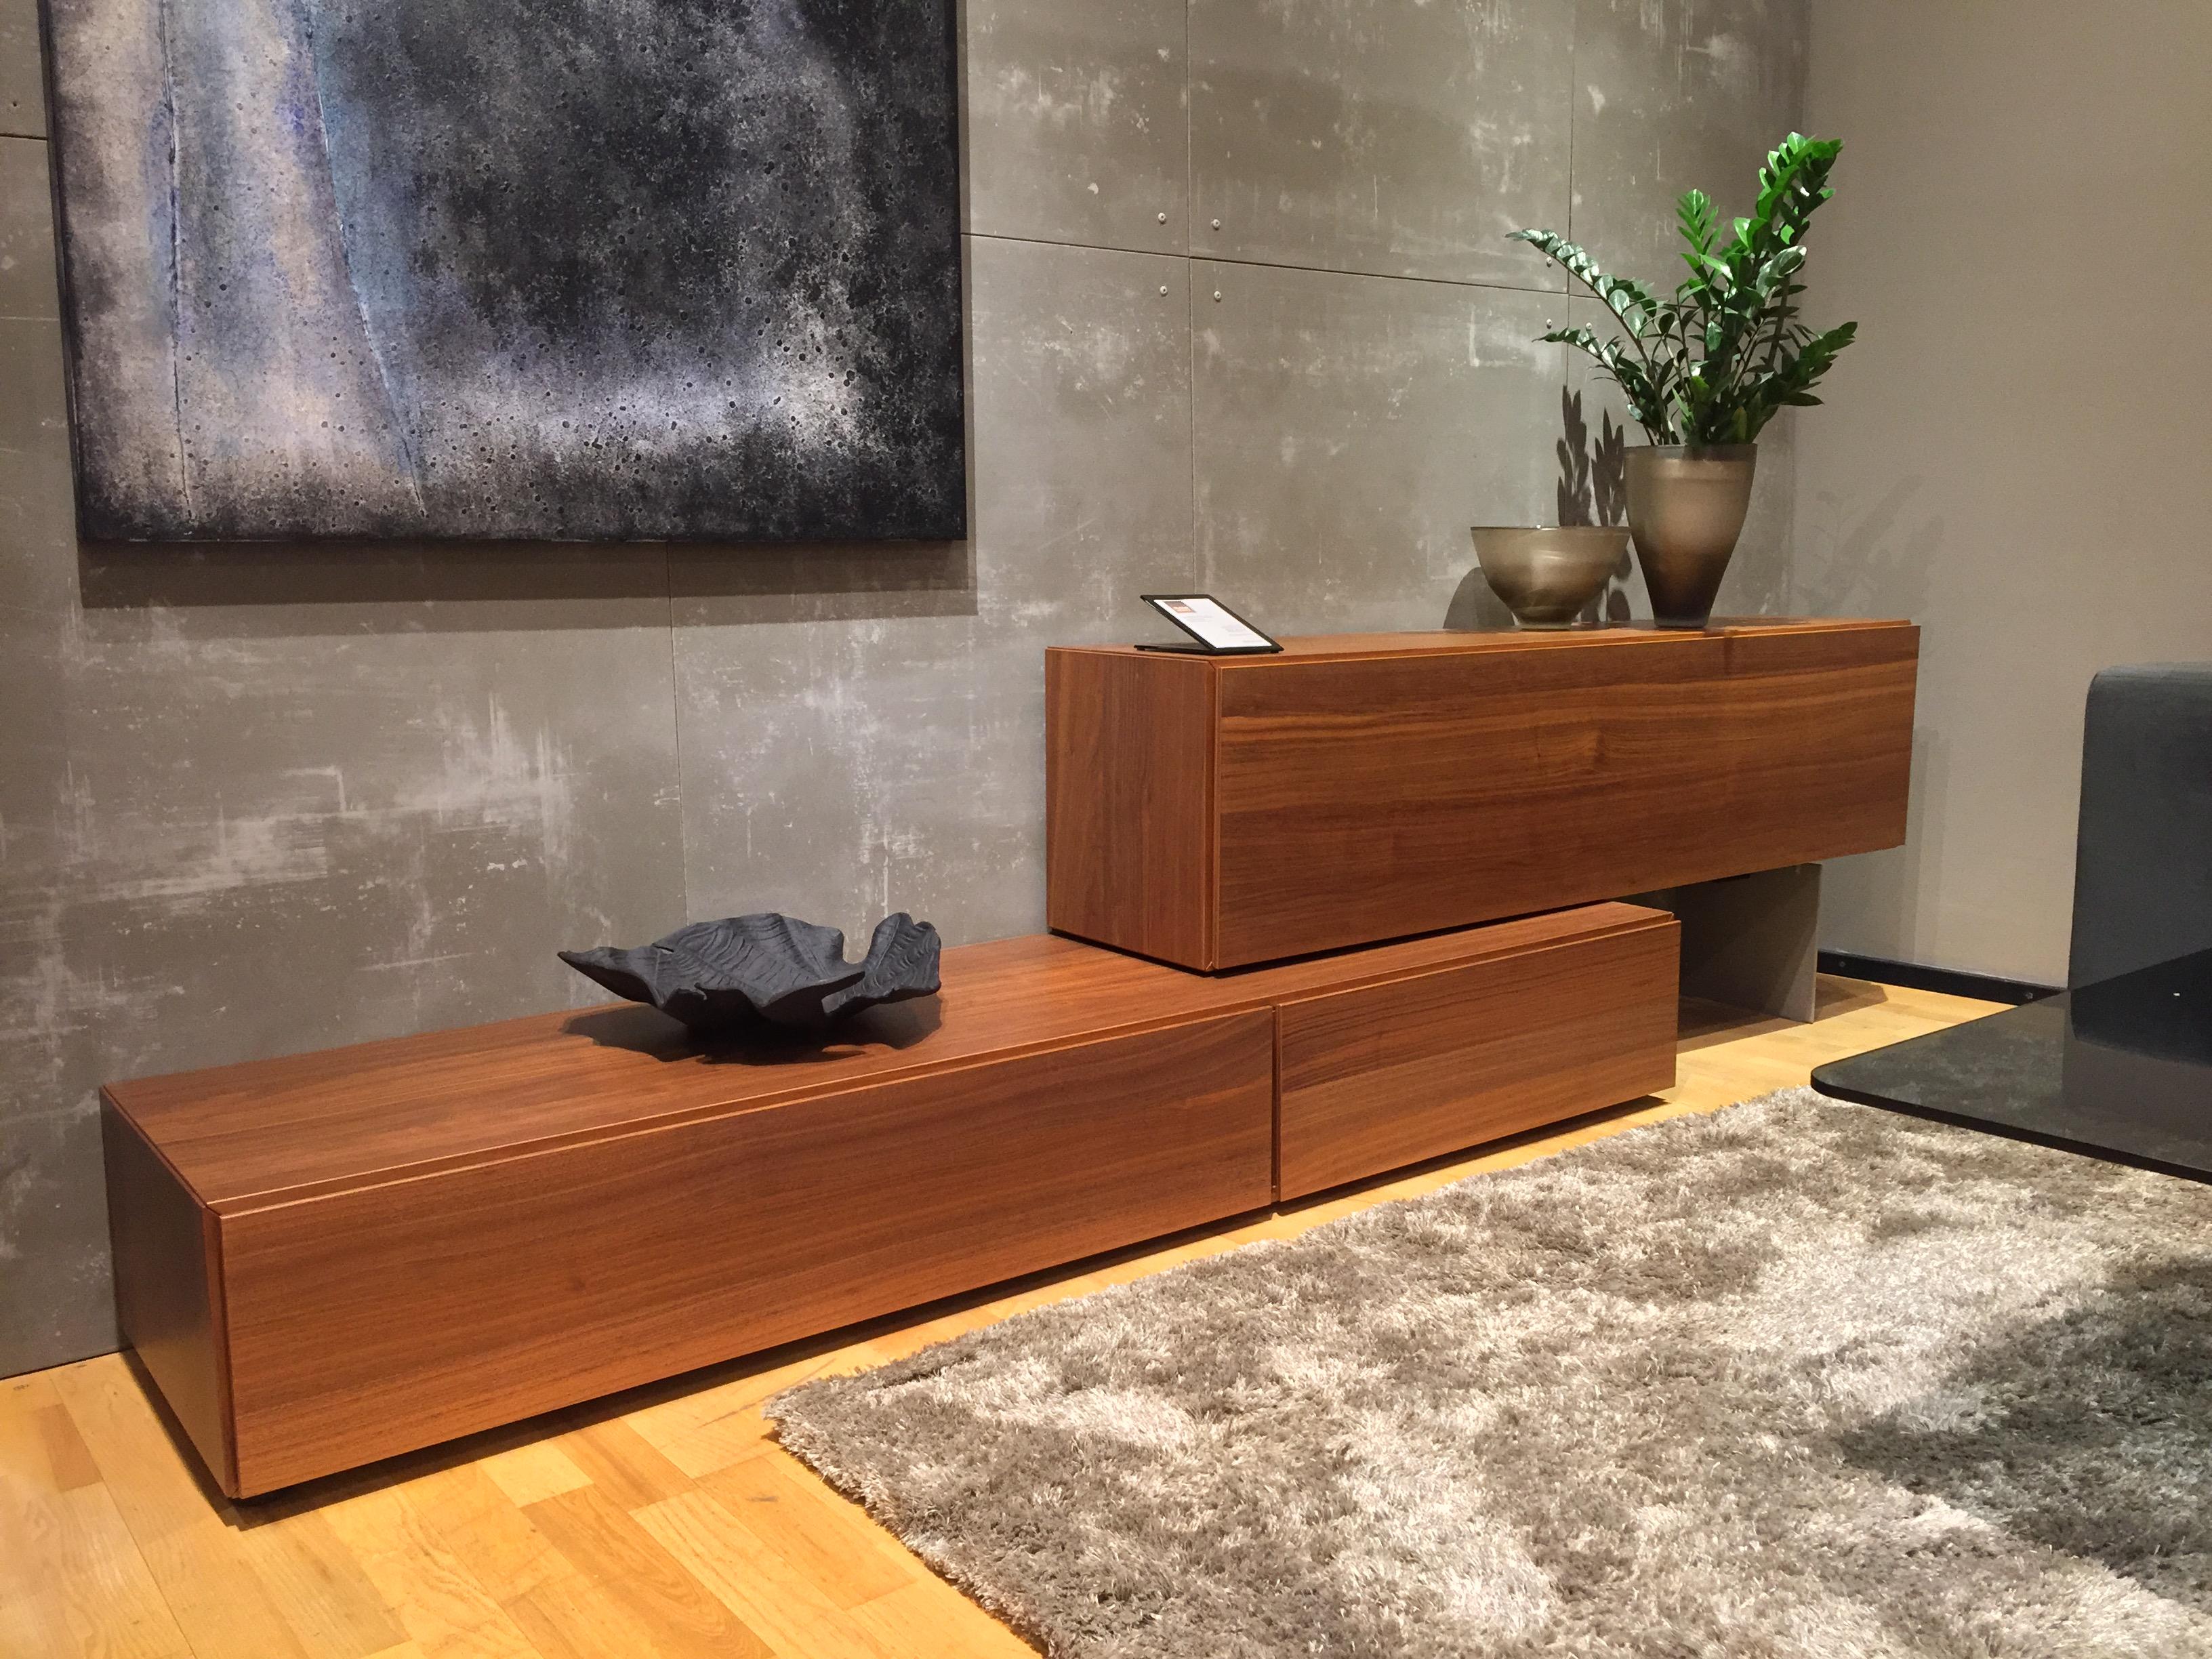 Lugano Tv cabinets